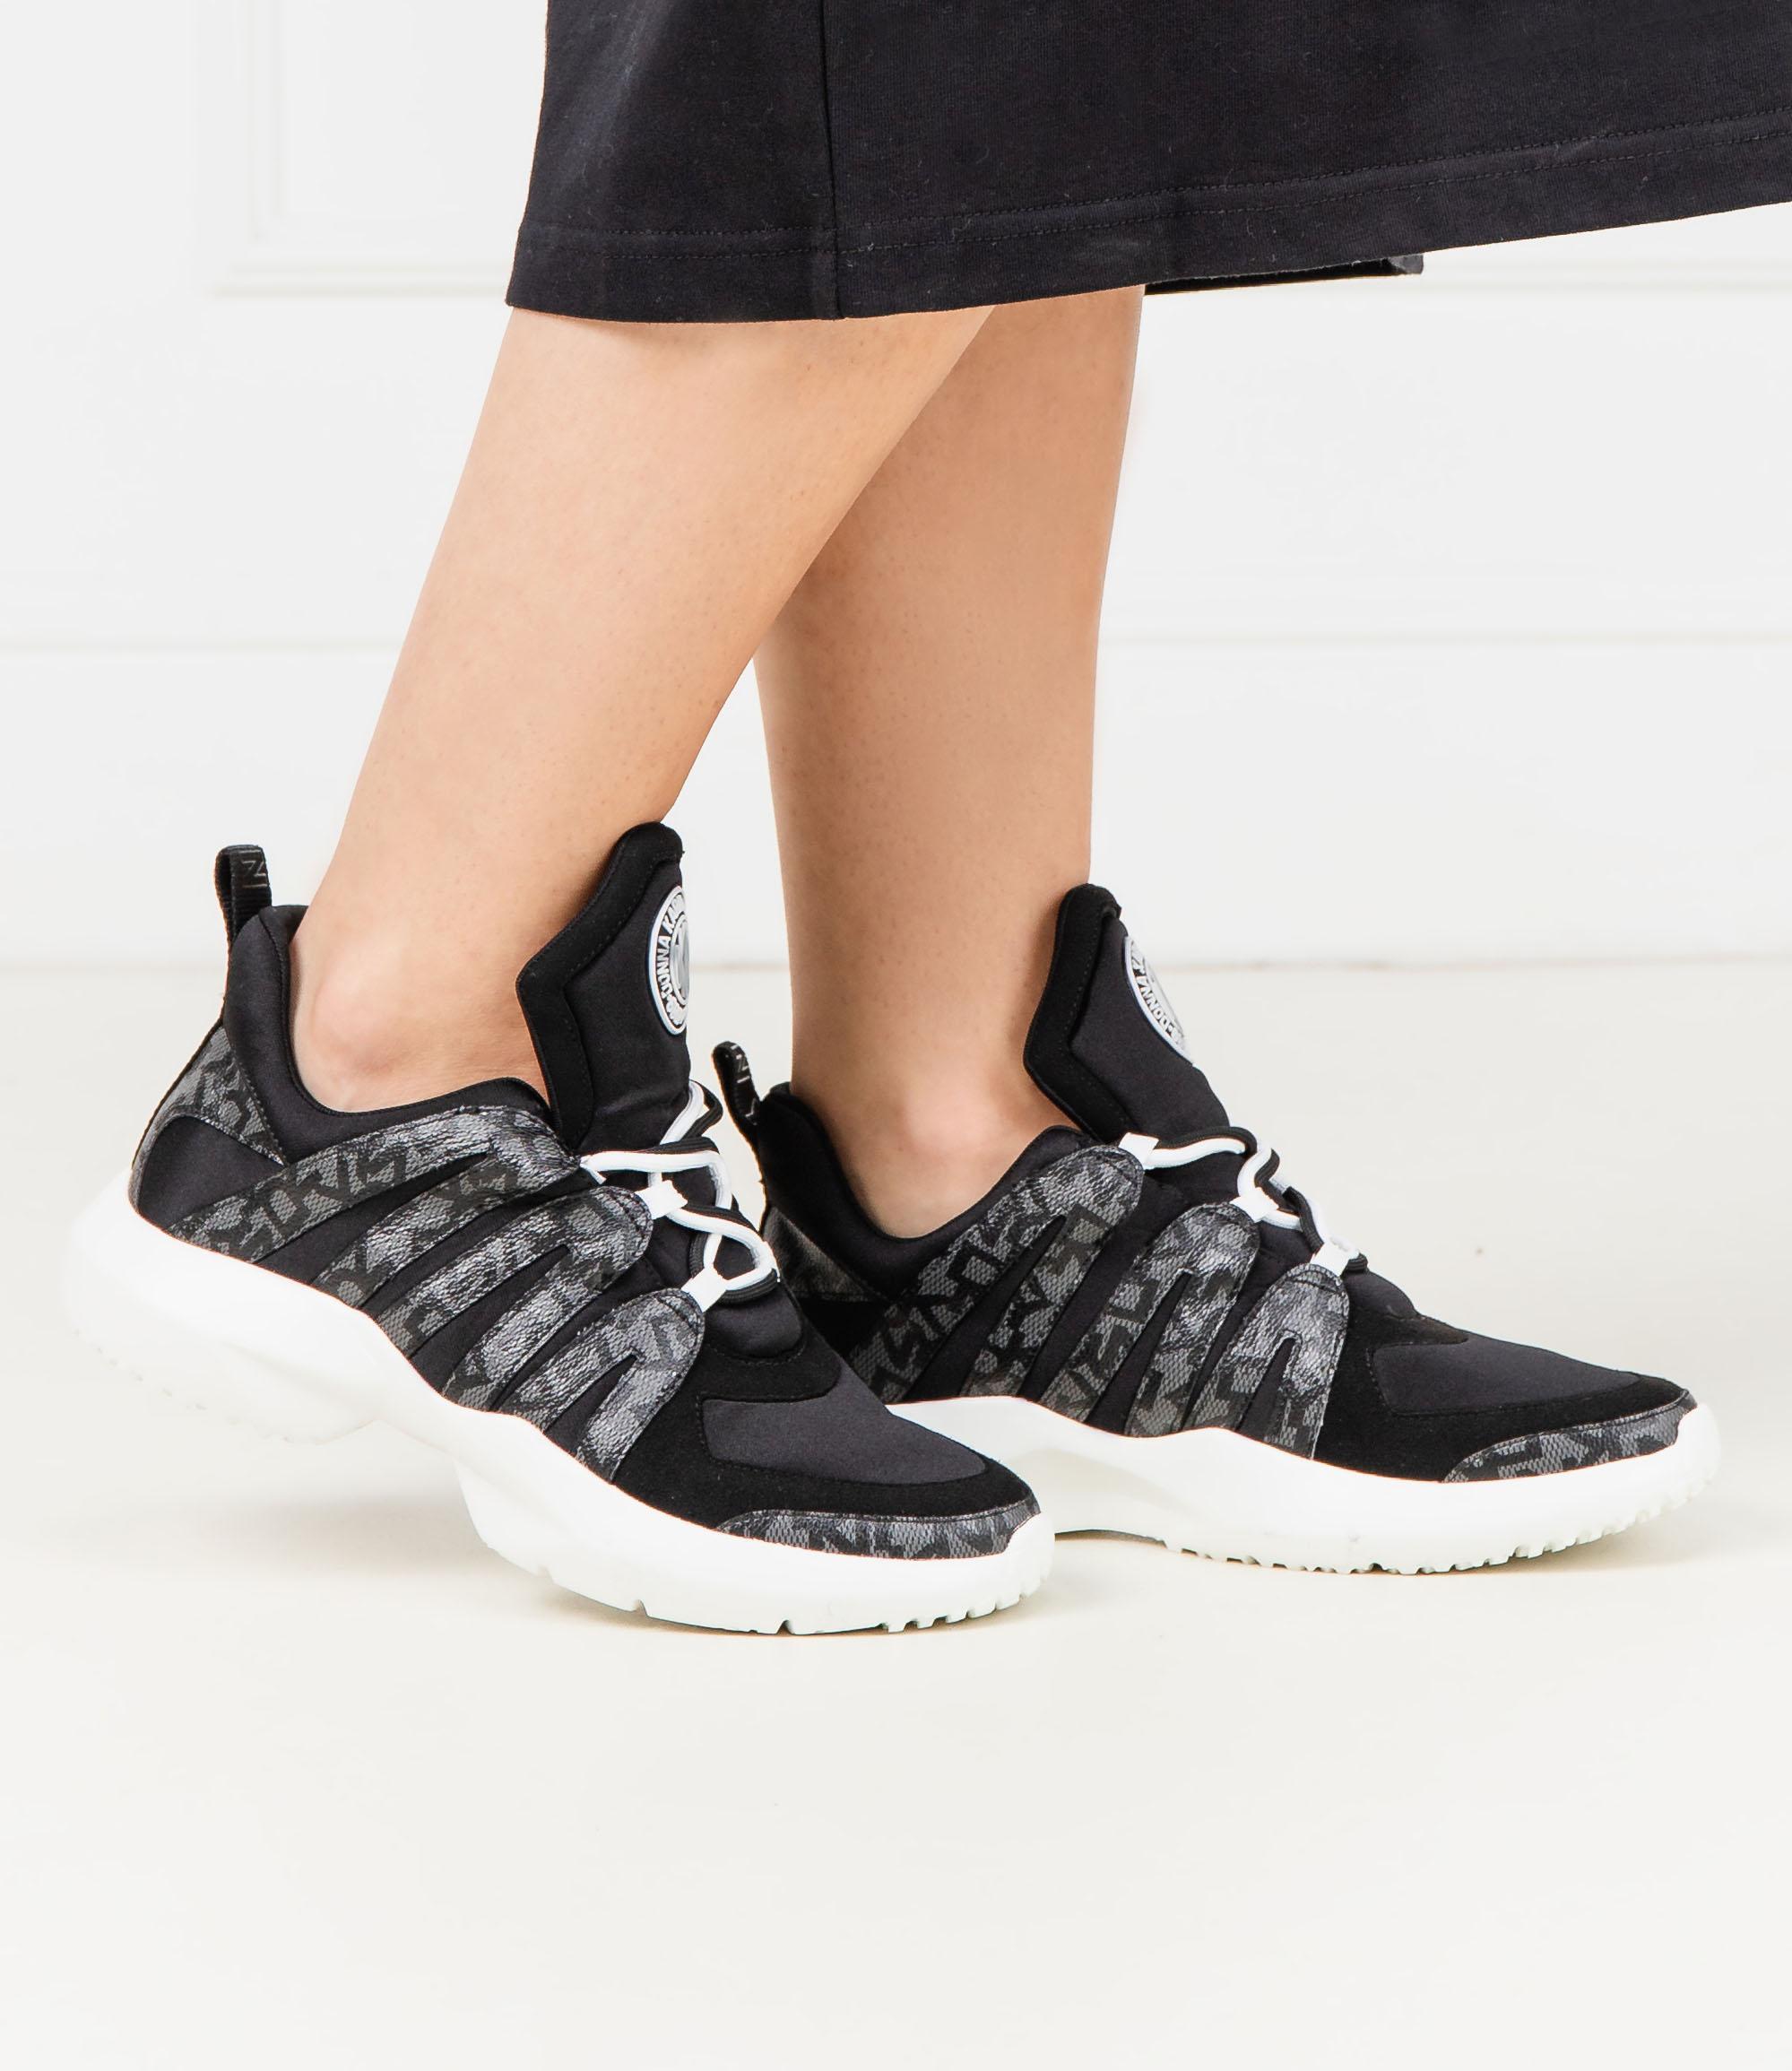 Sneakers LYNZIE DKNY | Black | Gomez.pl/en